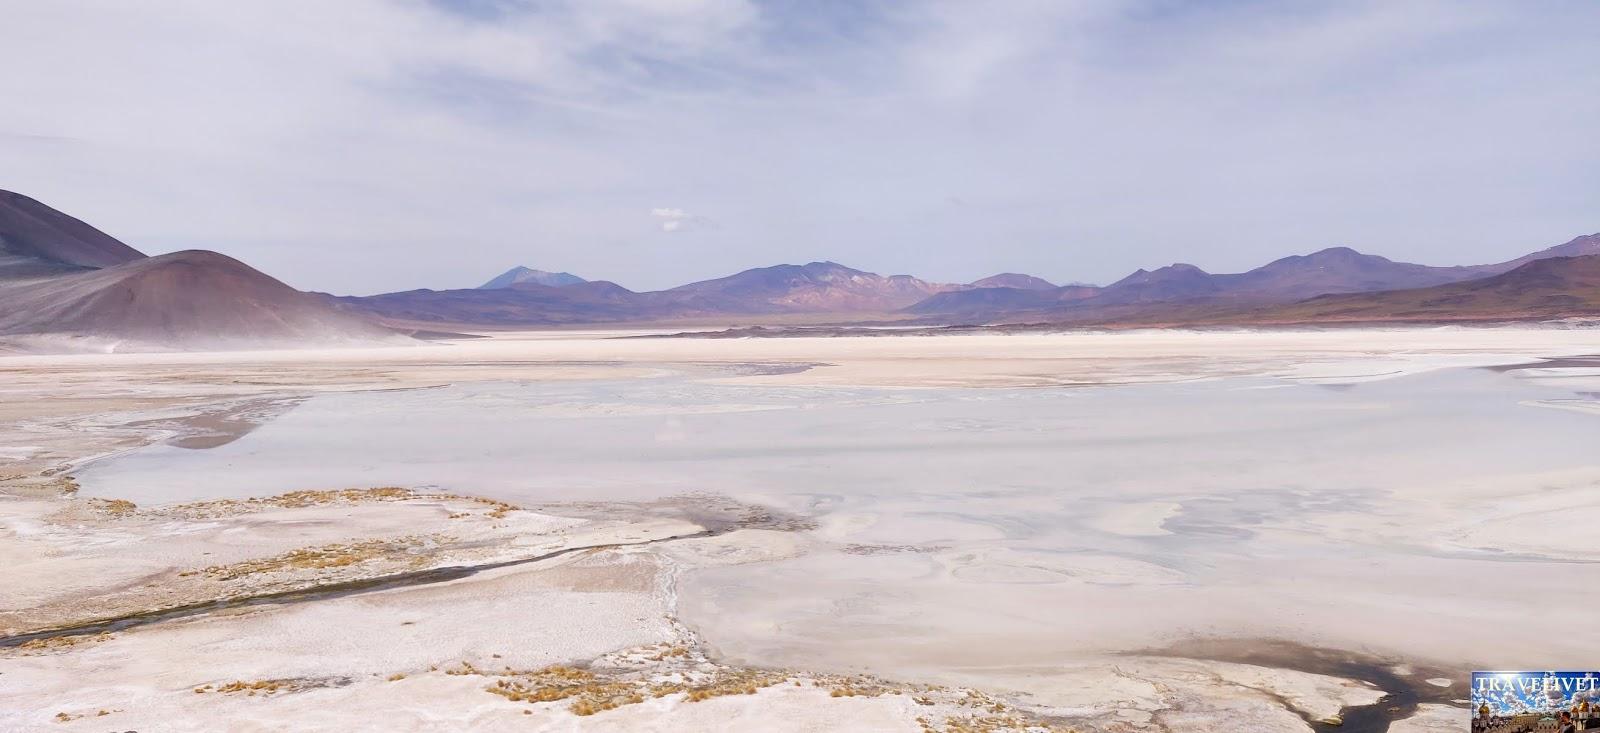 Chili Chile San Pedro de Atacama désert piedras rojas